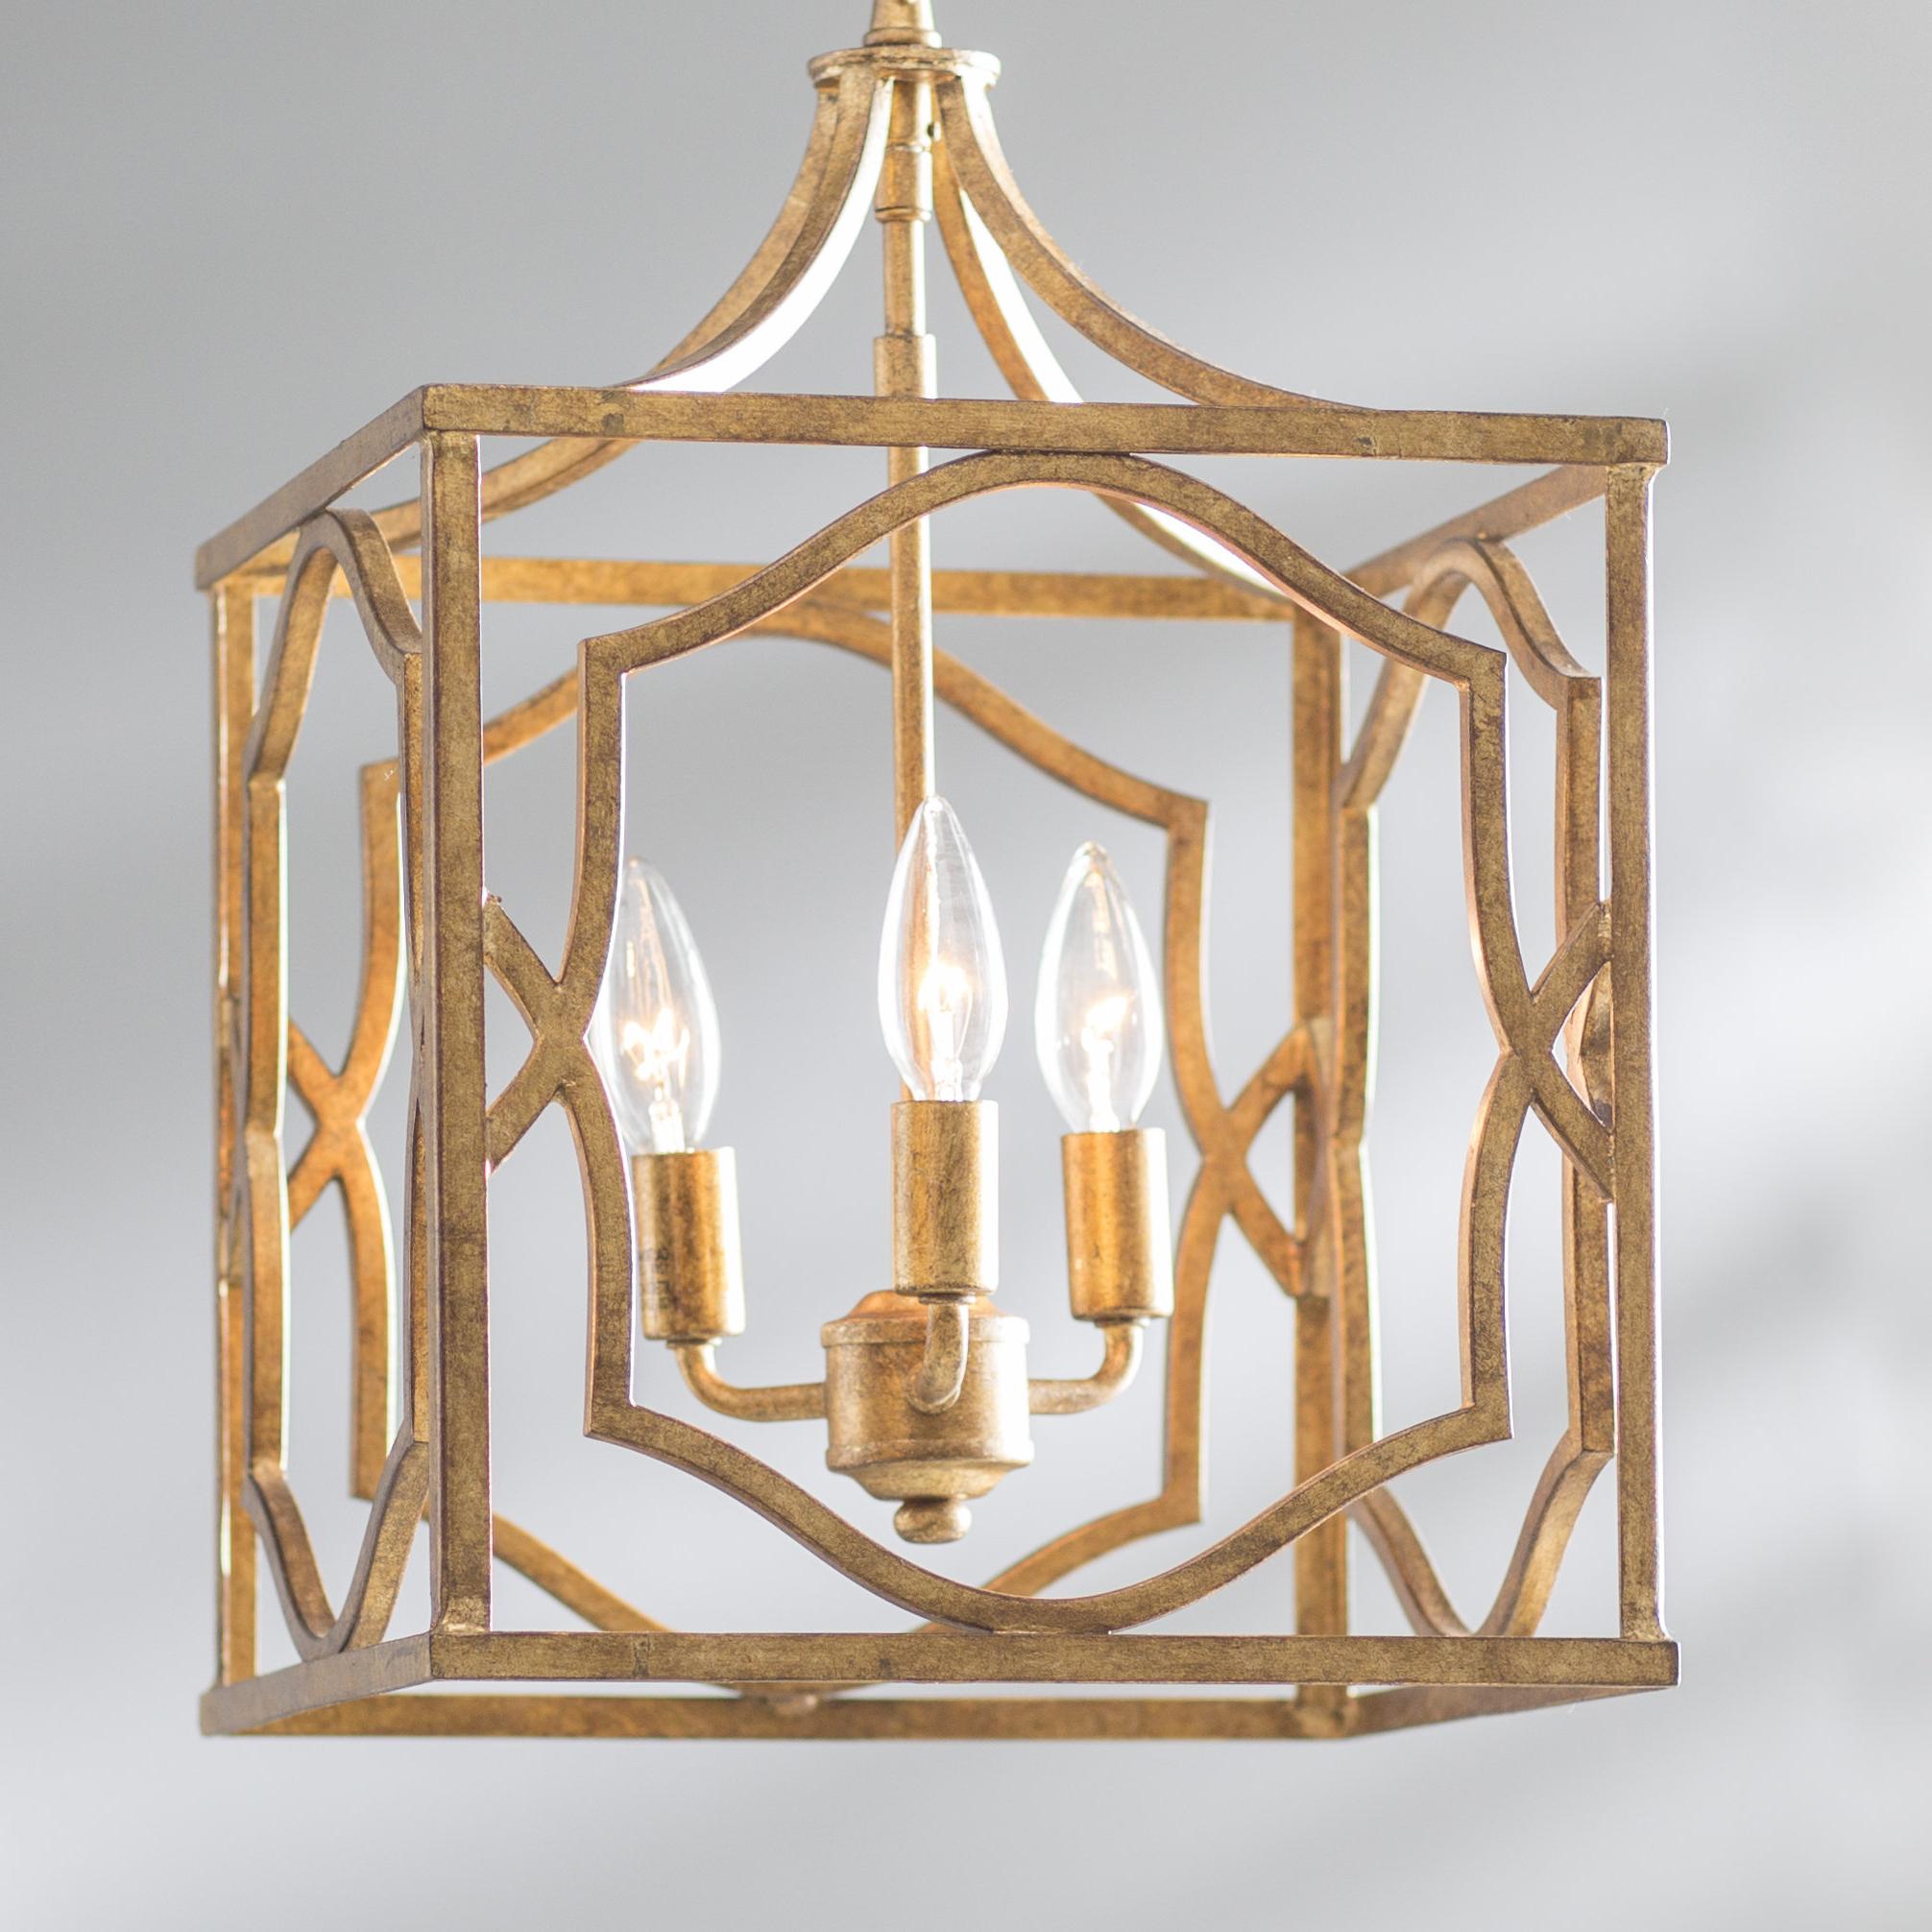 Destrey 3 Light Lantern Square/rectangle Pendants Within Most Recent Destrey 3 Light Lantern Square/rectangle Pendant (Gallery 6 of 25)